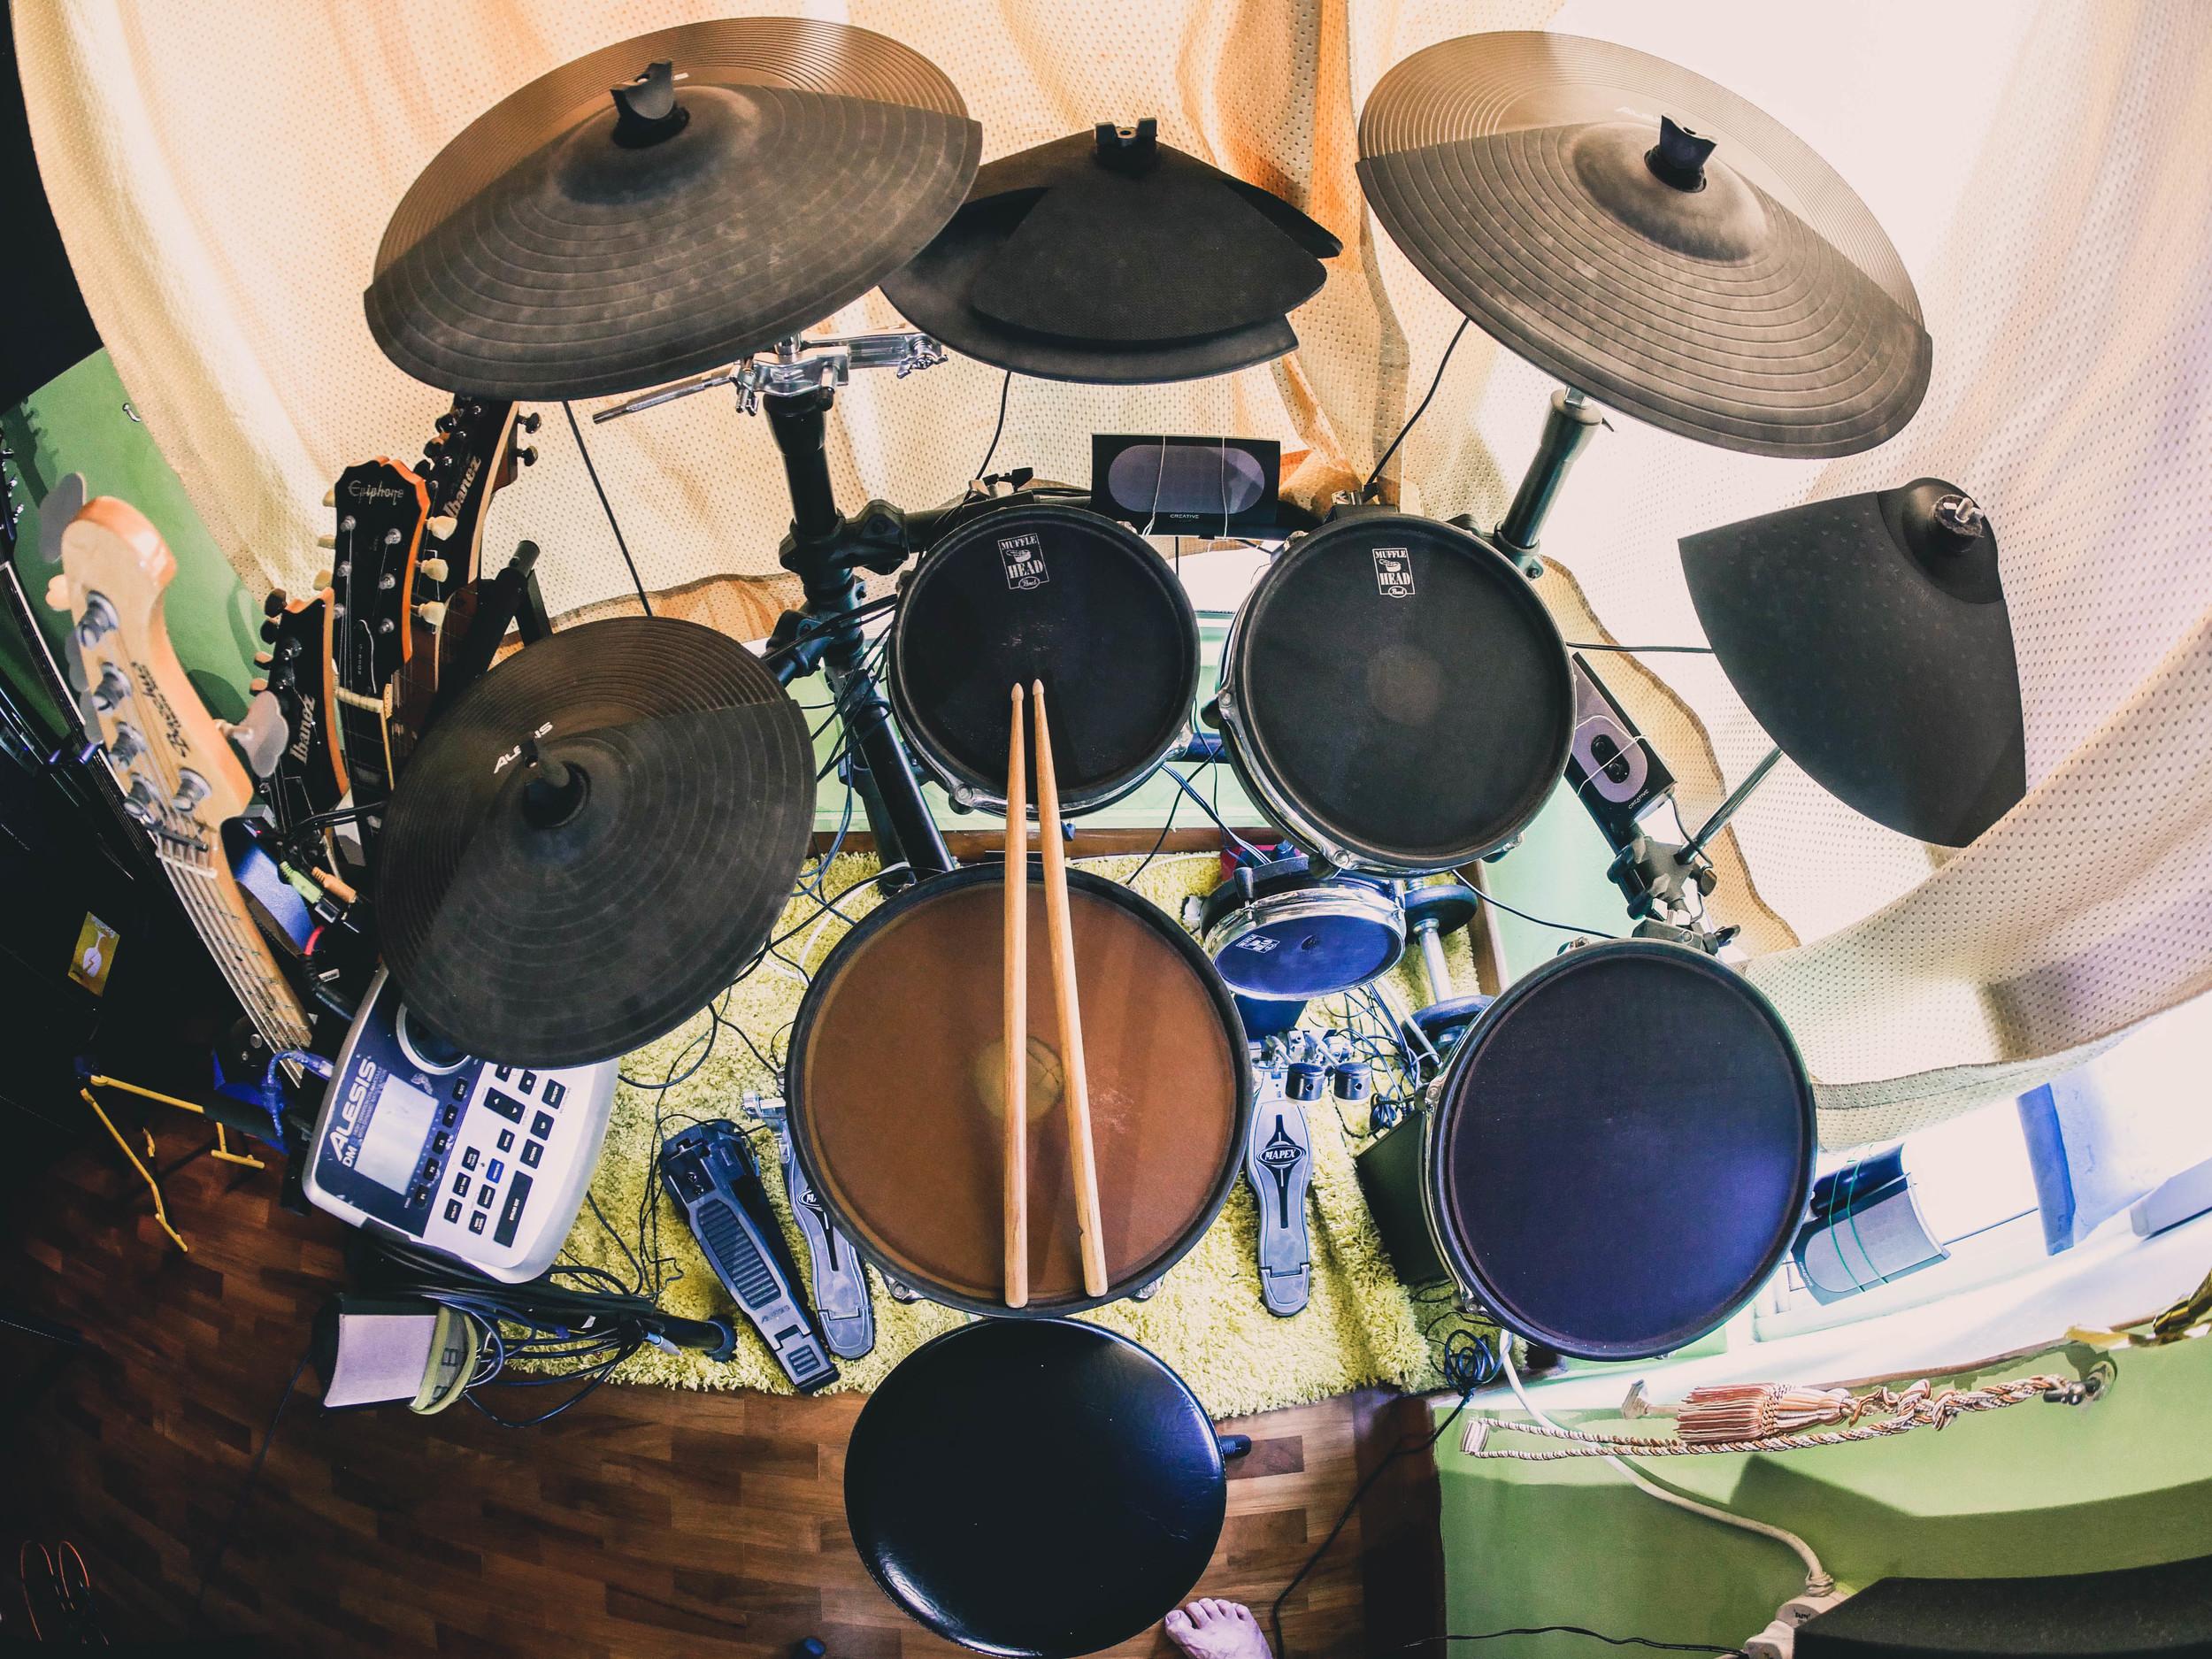 Alesis DM8 E-Drum Kit